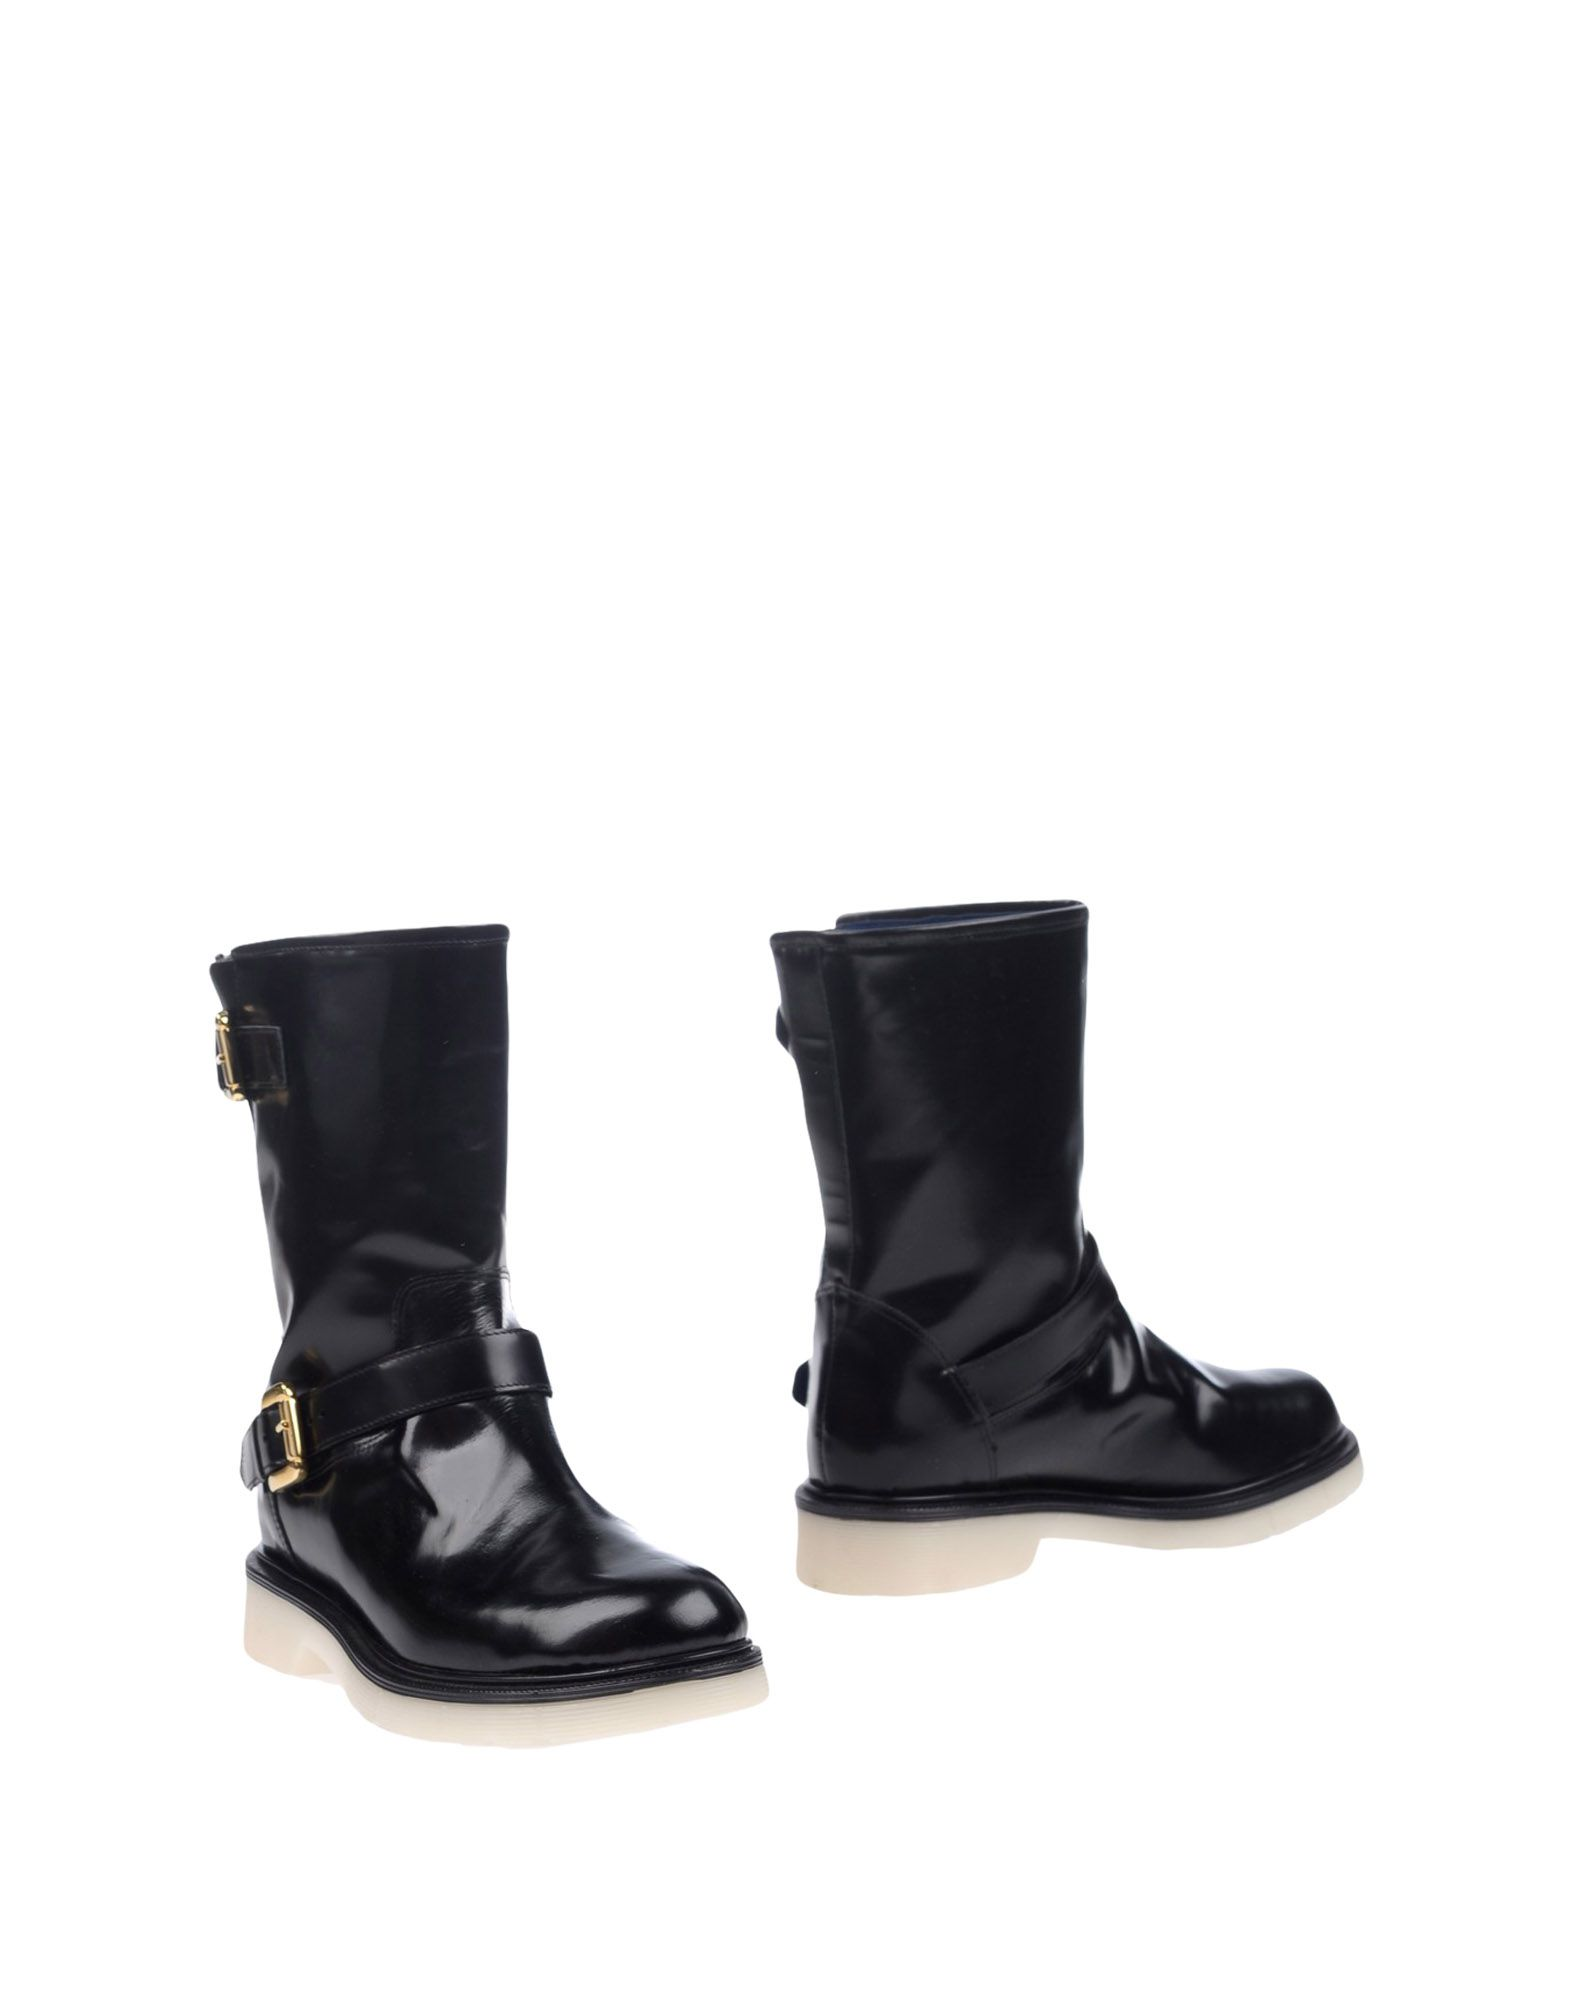 Hego's Hego's Hego's Liverpool Stiefelette Damen  11304385LS Gute Qualität beliebte Schuhe 0e47d7